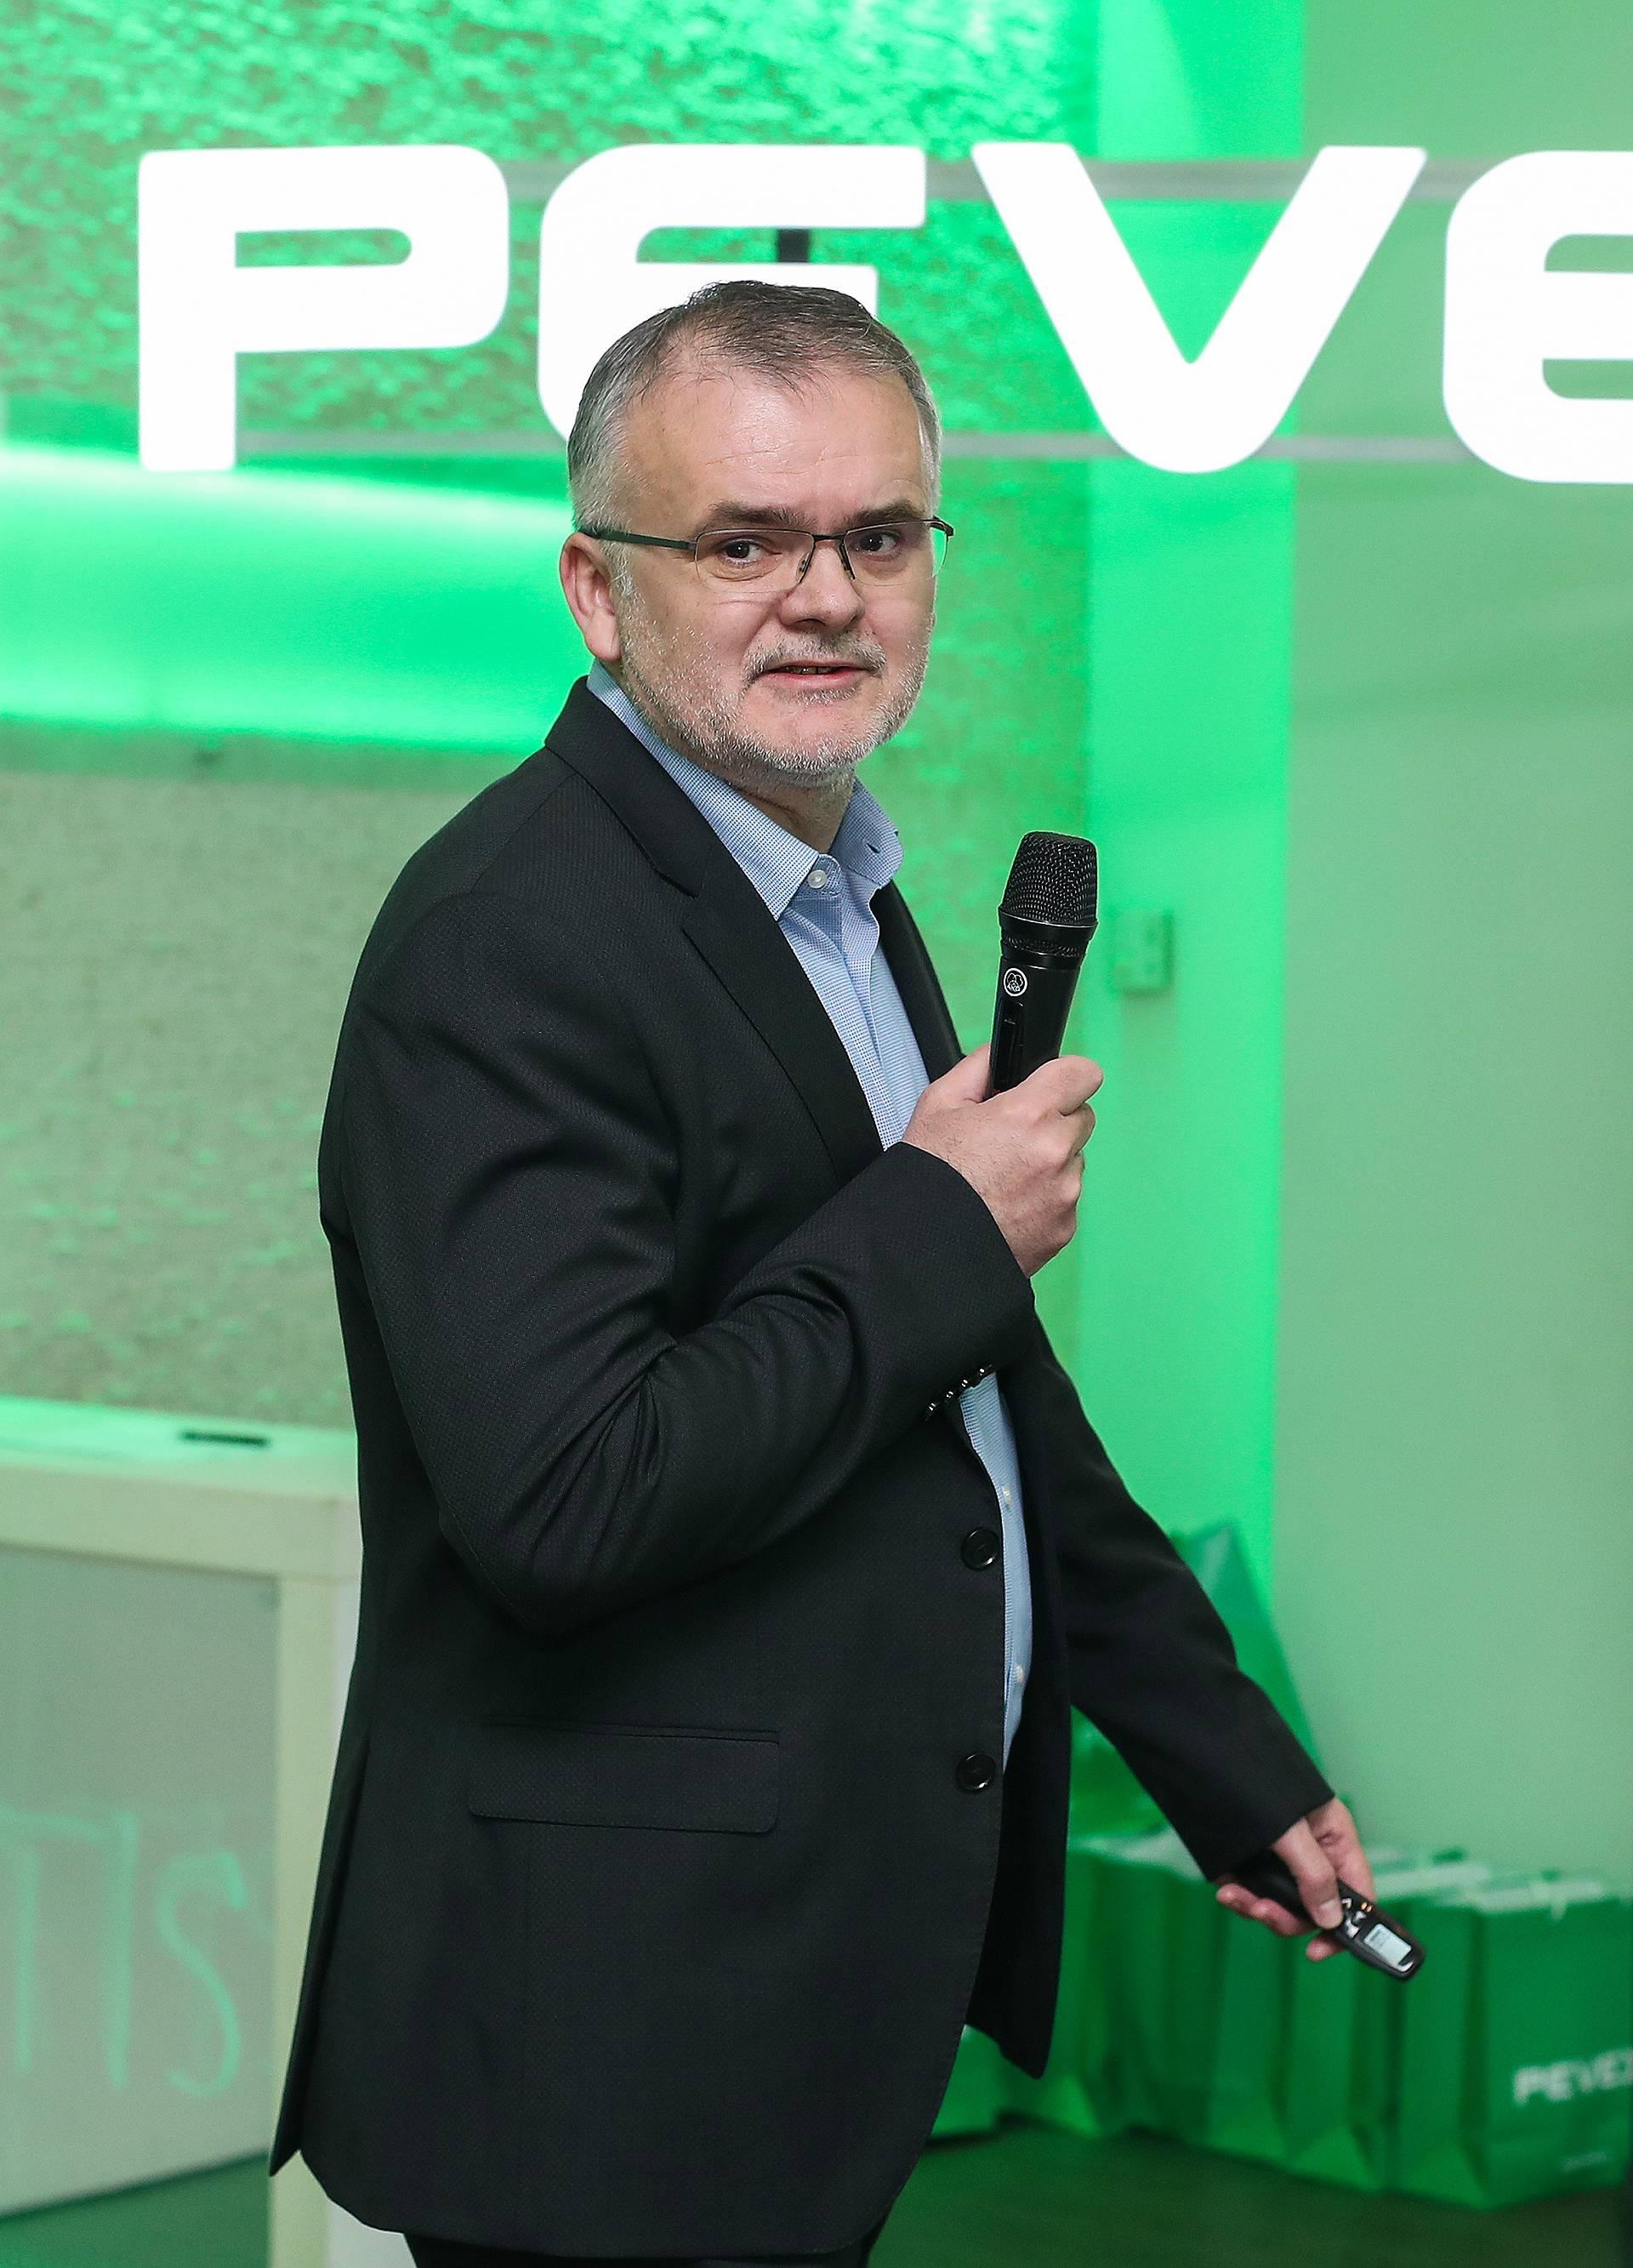 Lovrinčević iz Pevexa: 'Dajte da naši ljudi zarade svoj kruh'